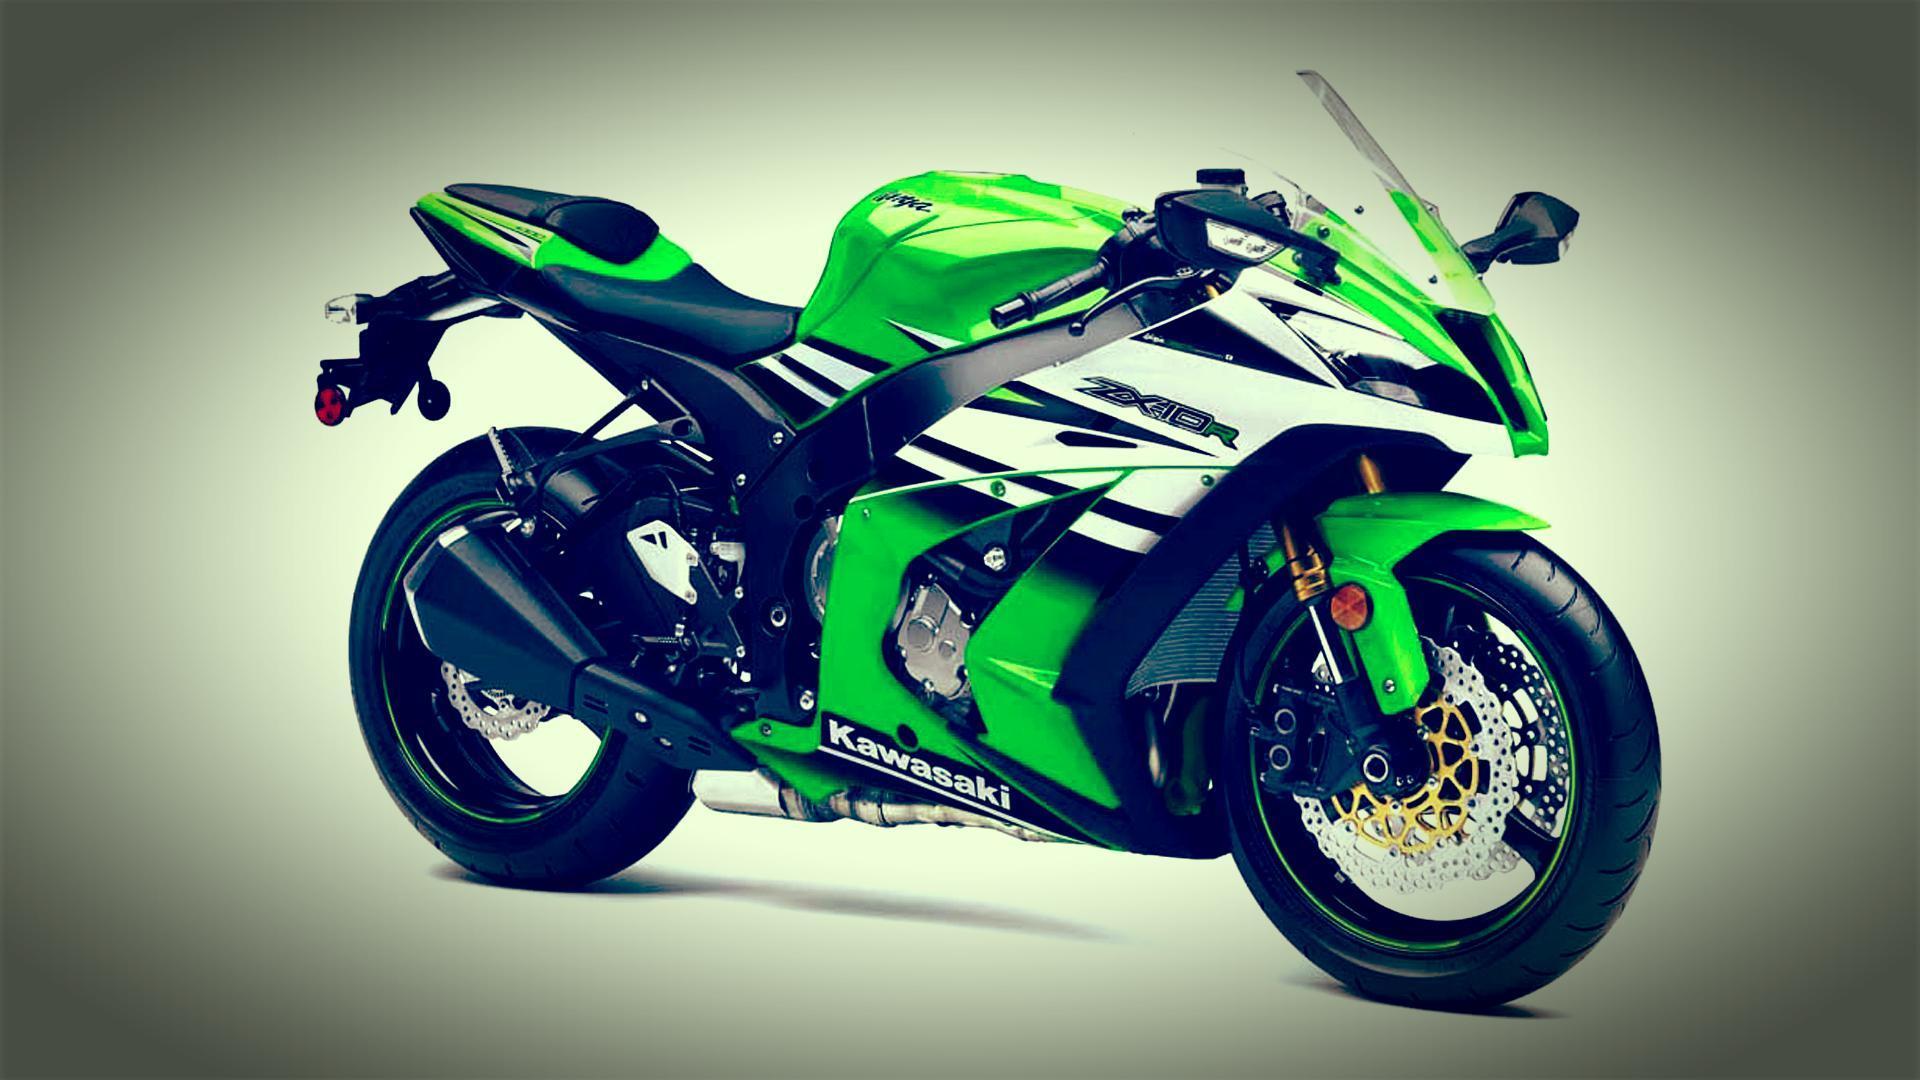 Kawasaki Ninja 1000 Wallpapers - Top Free Kawasaki Ninja